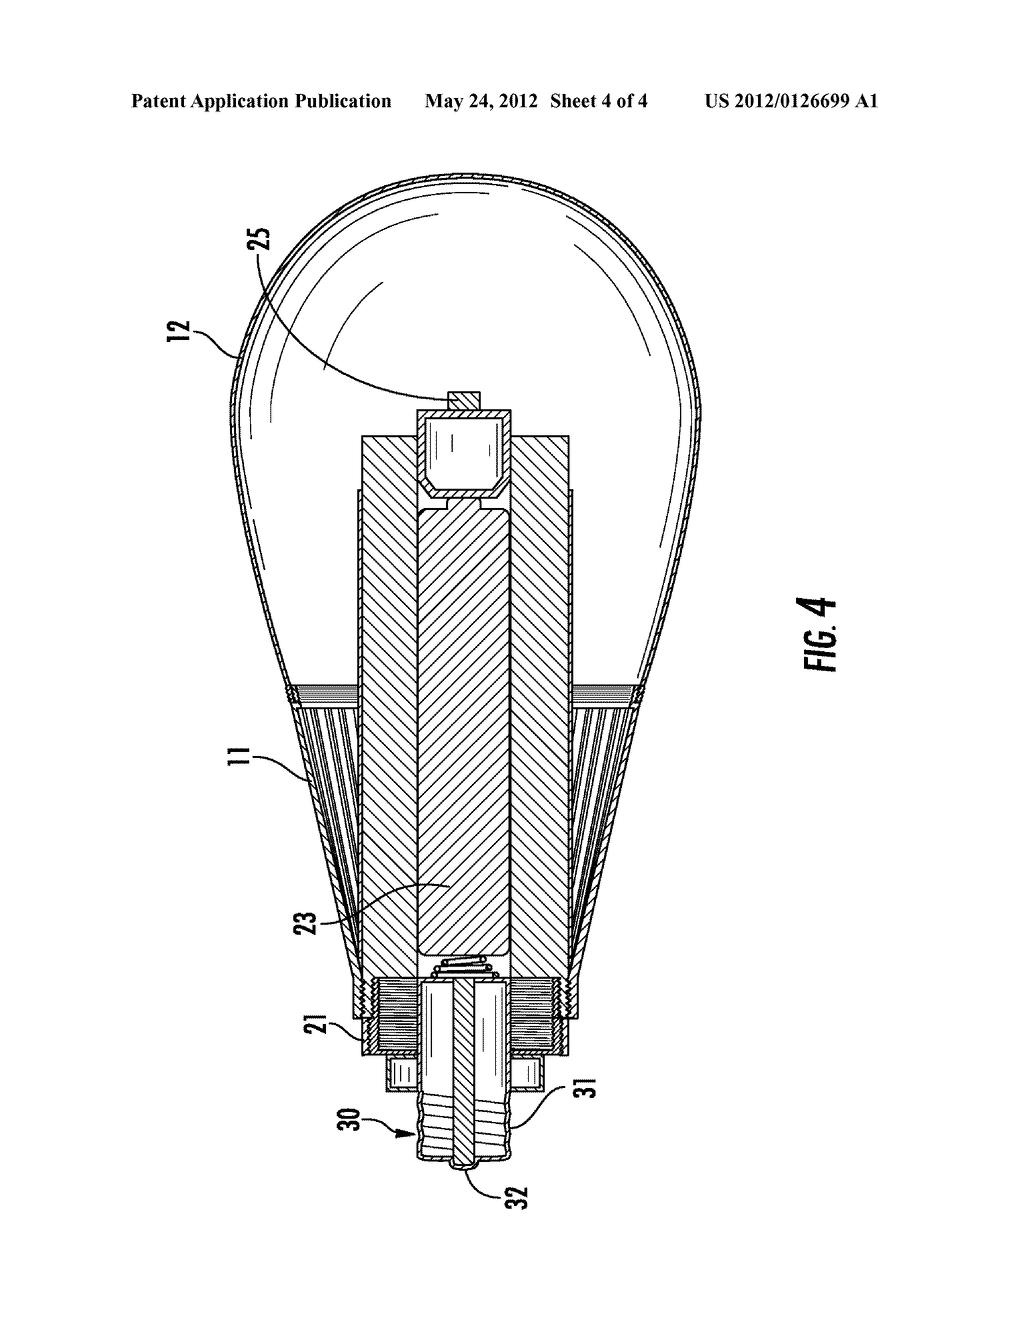 led bulb led bulb diagram rh ledbulbsankei blogspot com led light bulb sankey diagram Light Bulb Parts Labeled